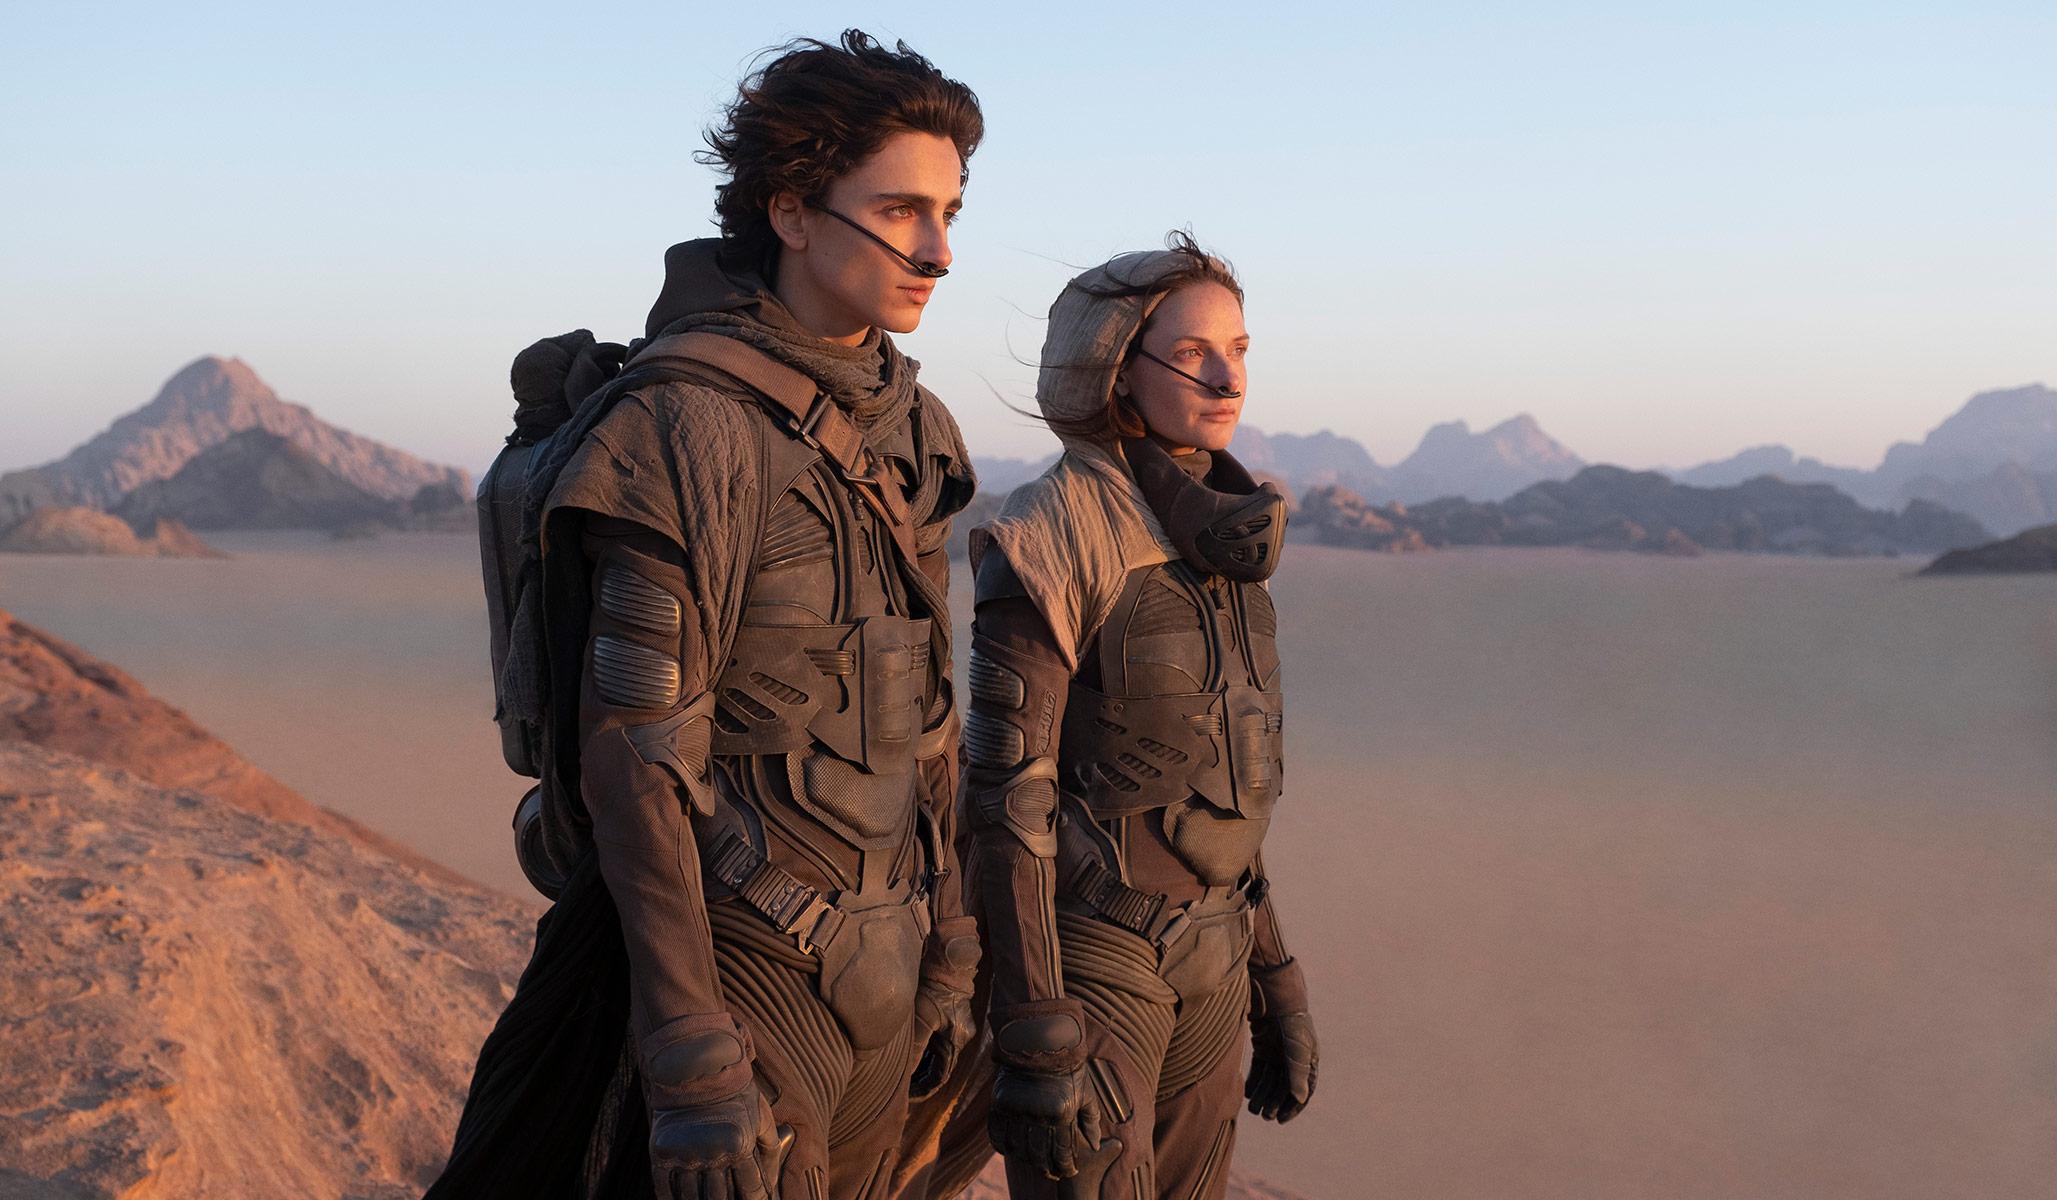 Will Denis Villeneuve Capture the Greatness of <i>Dune</i>?